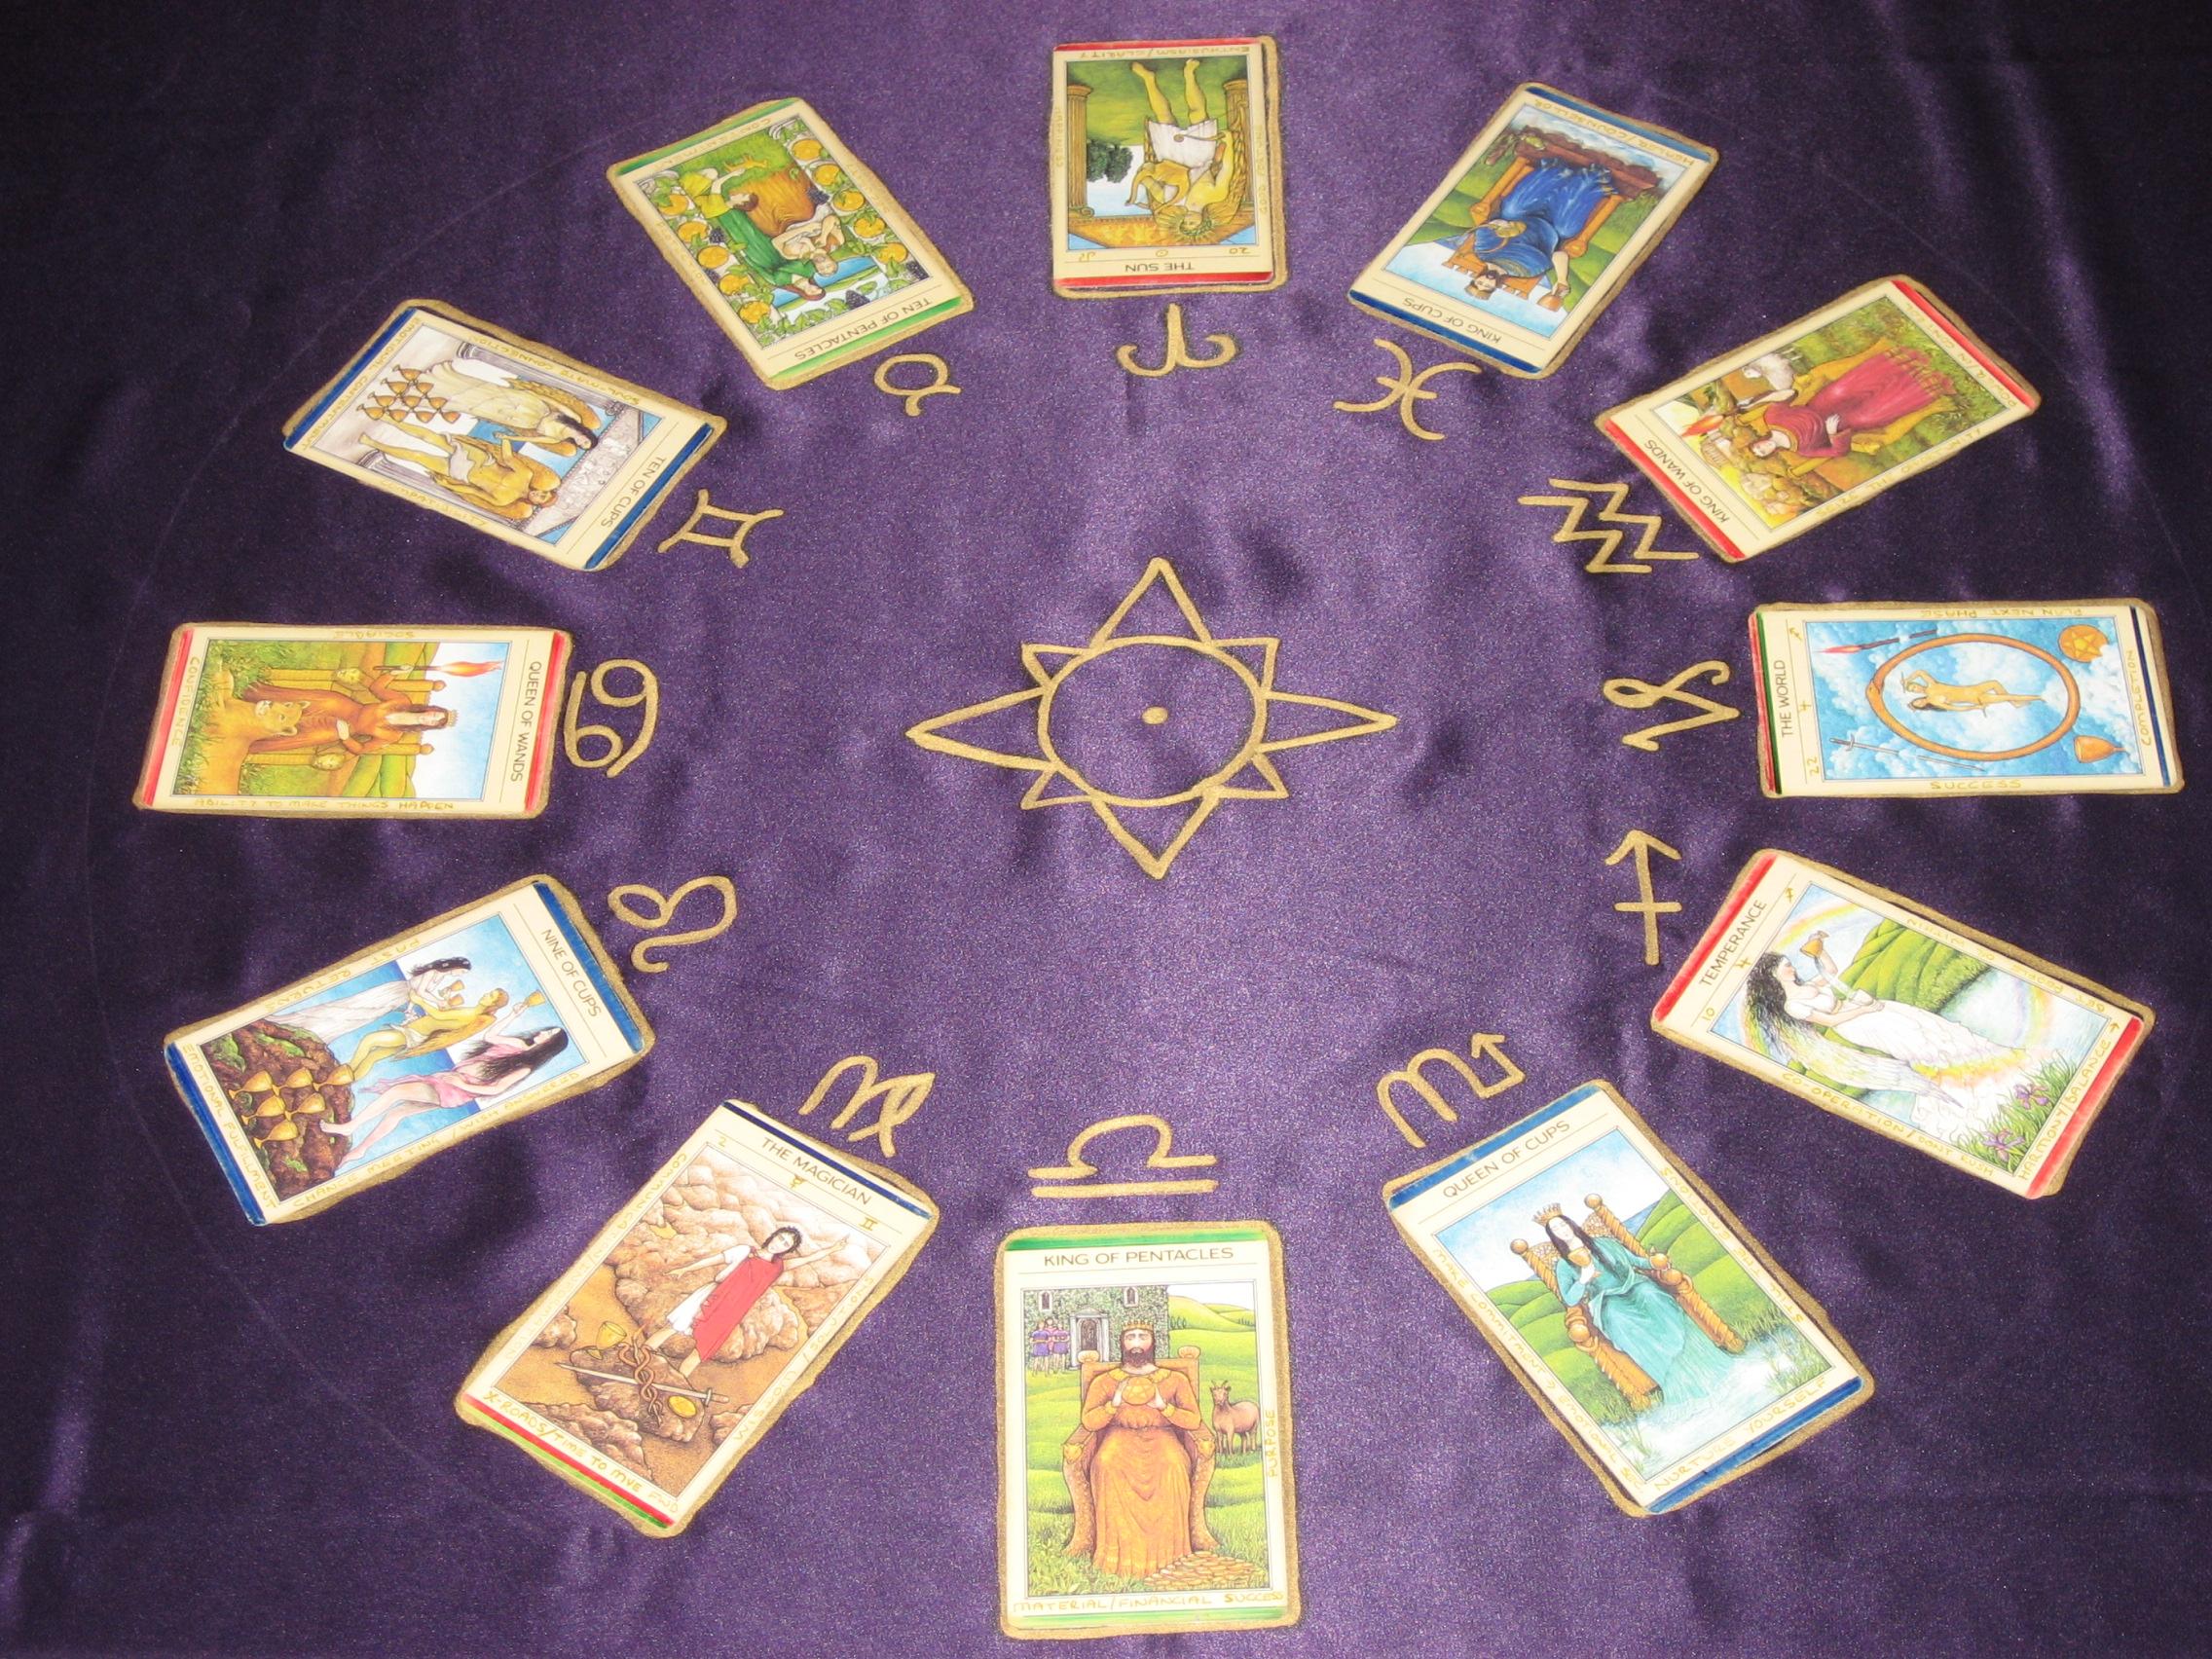 Tarot Cards - Top 4 Lưu Ý Khi Đọc Bài Tarot